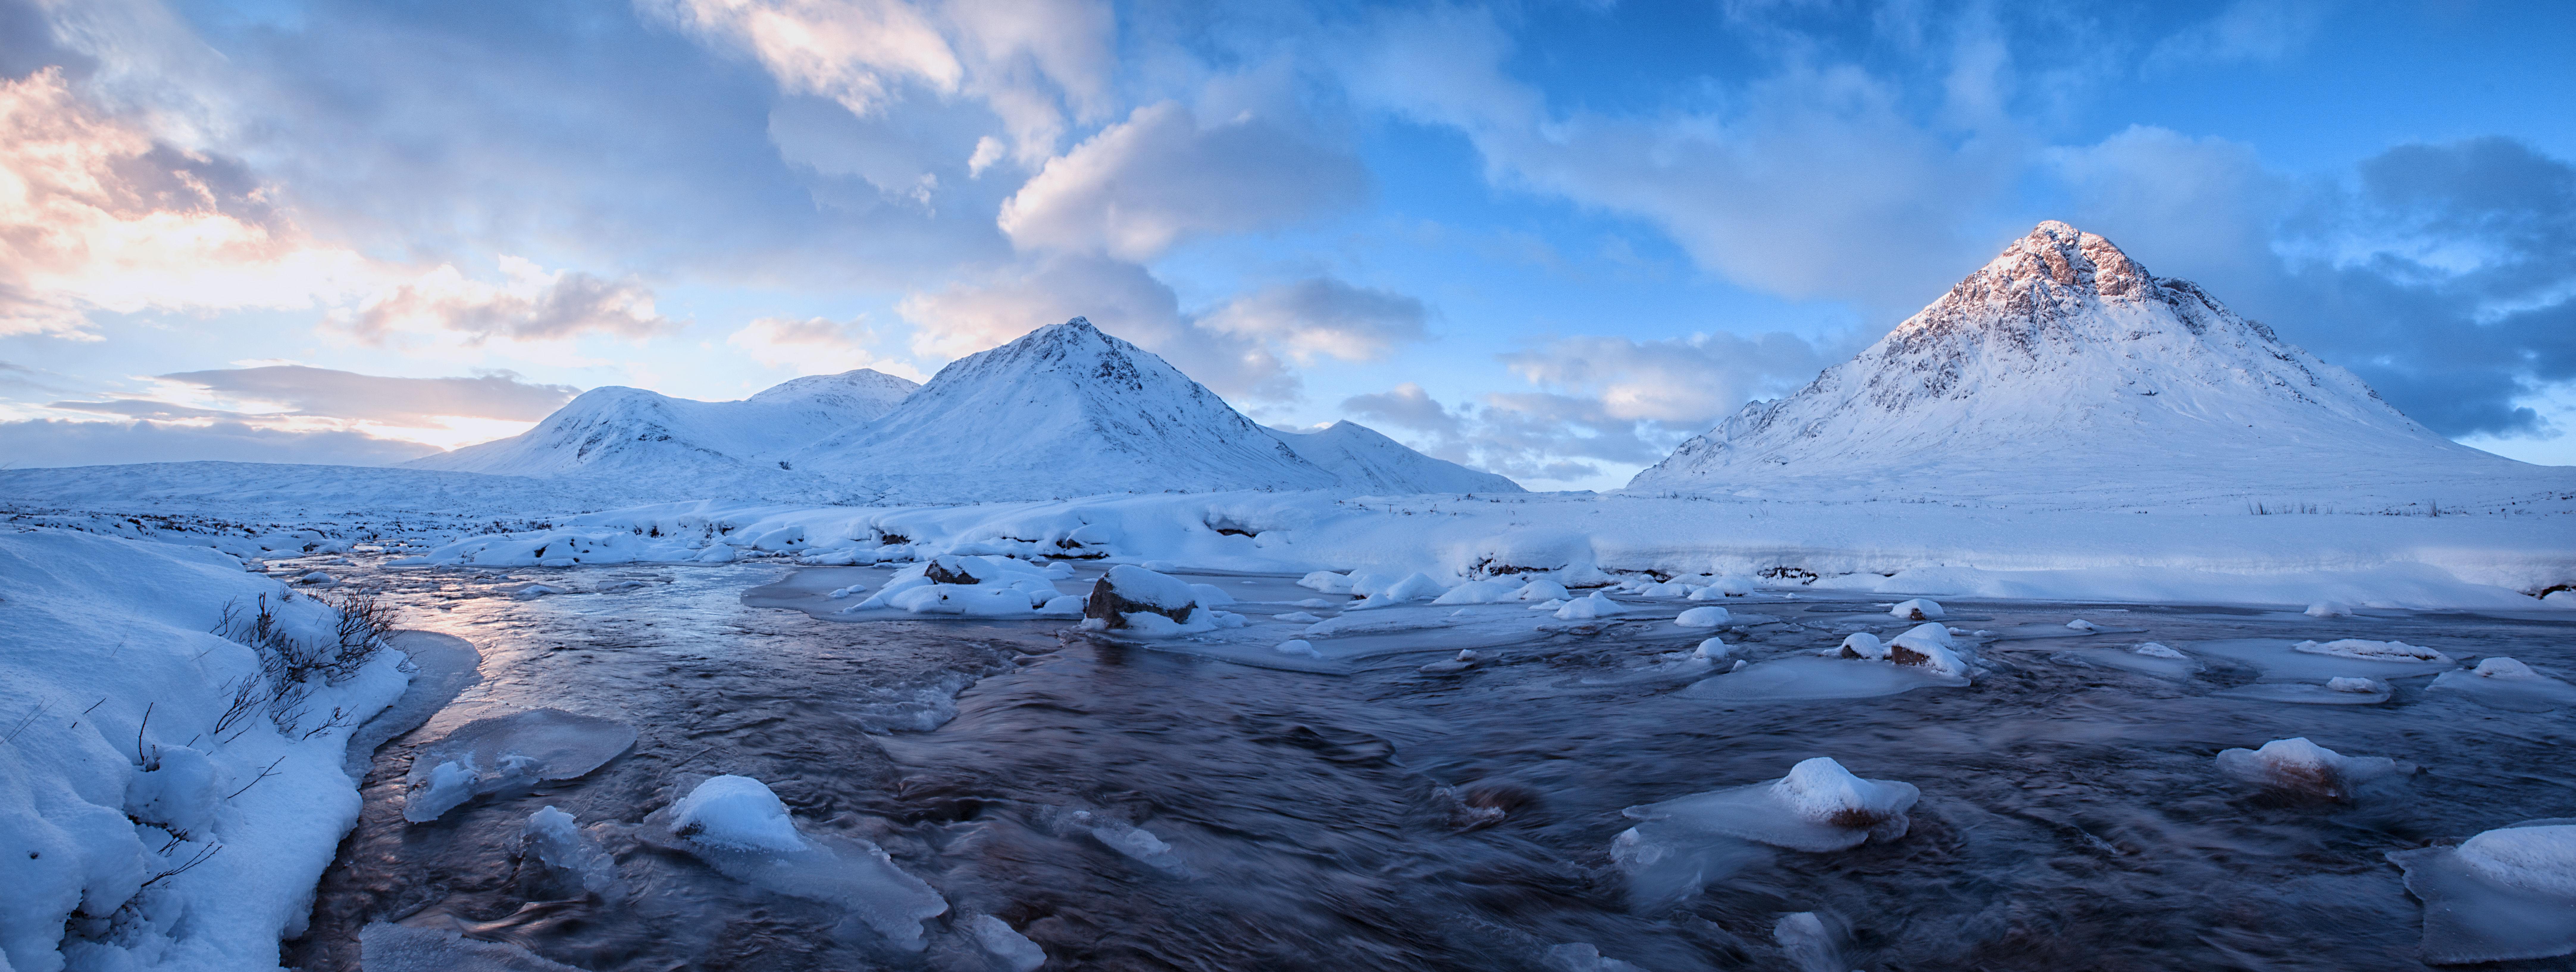 Free Images : snow, winter, dawn, mountain range, ice ...